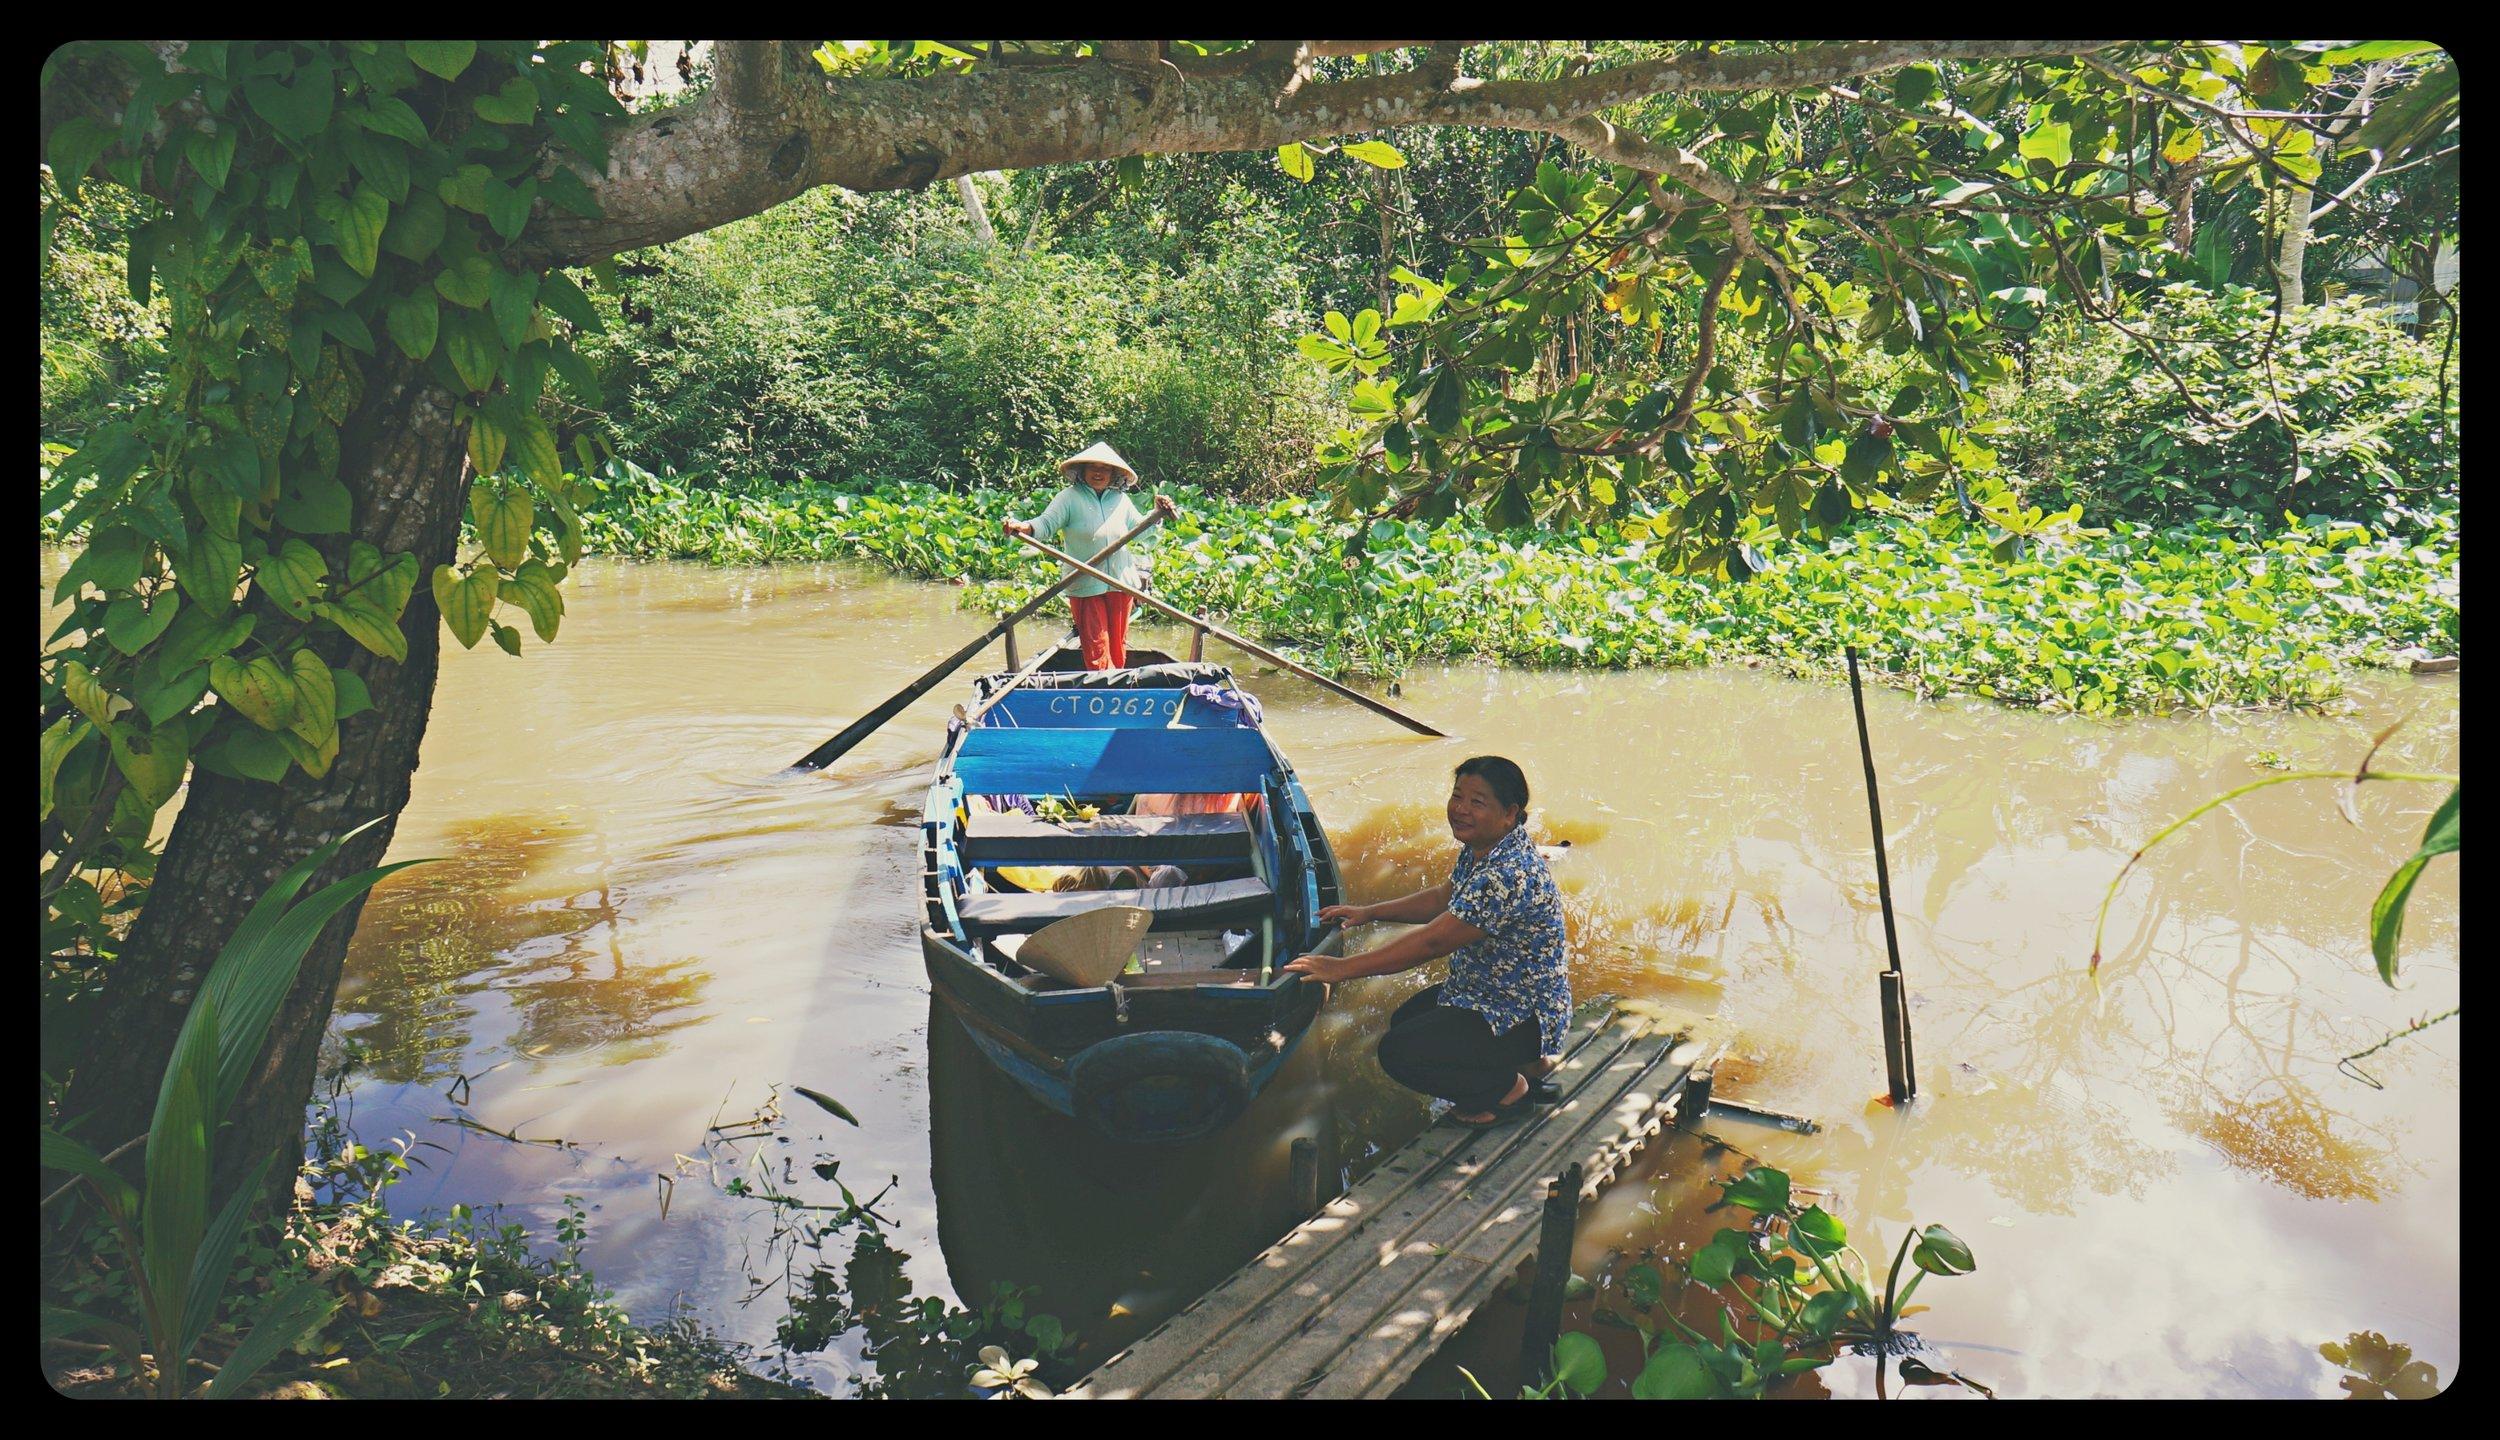 Mekong Delta trip with Mrs. Ha (on the footbridge)